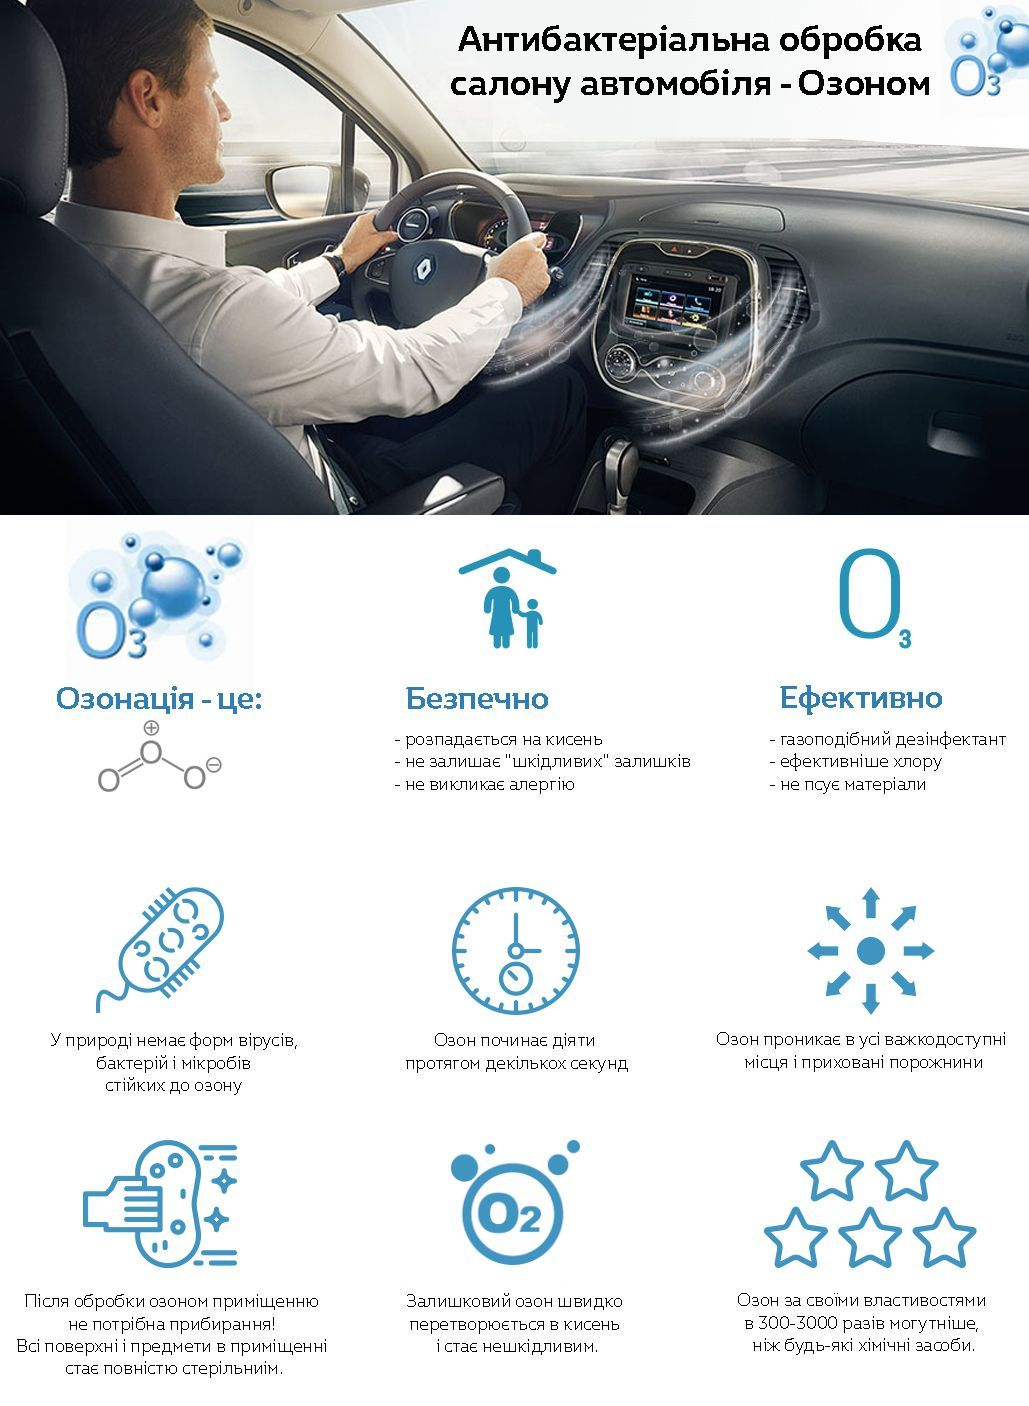 Антибактеріальна обробка Озоном Renault